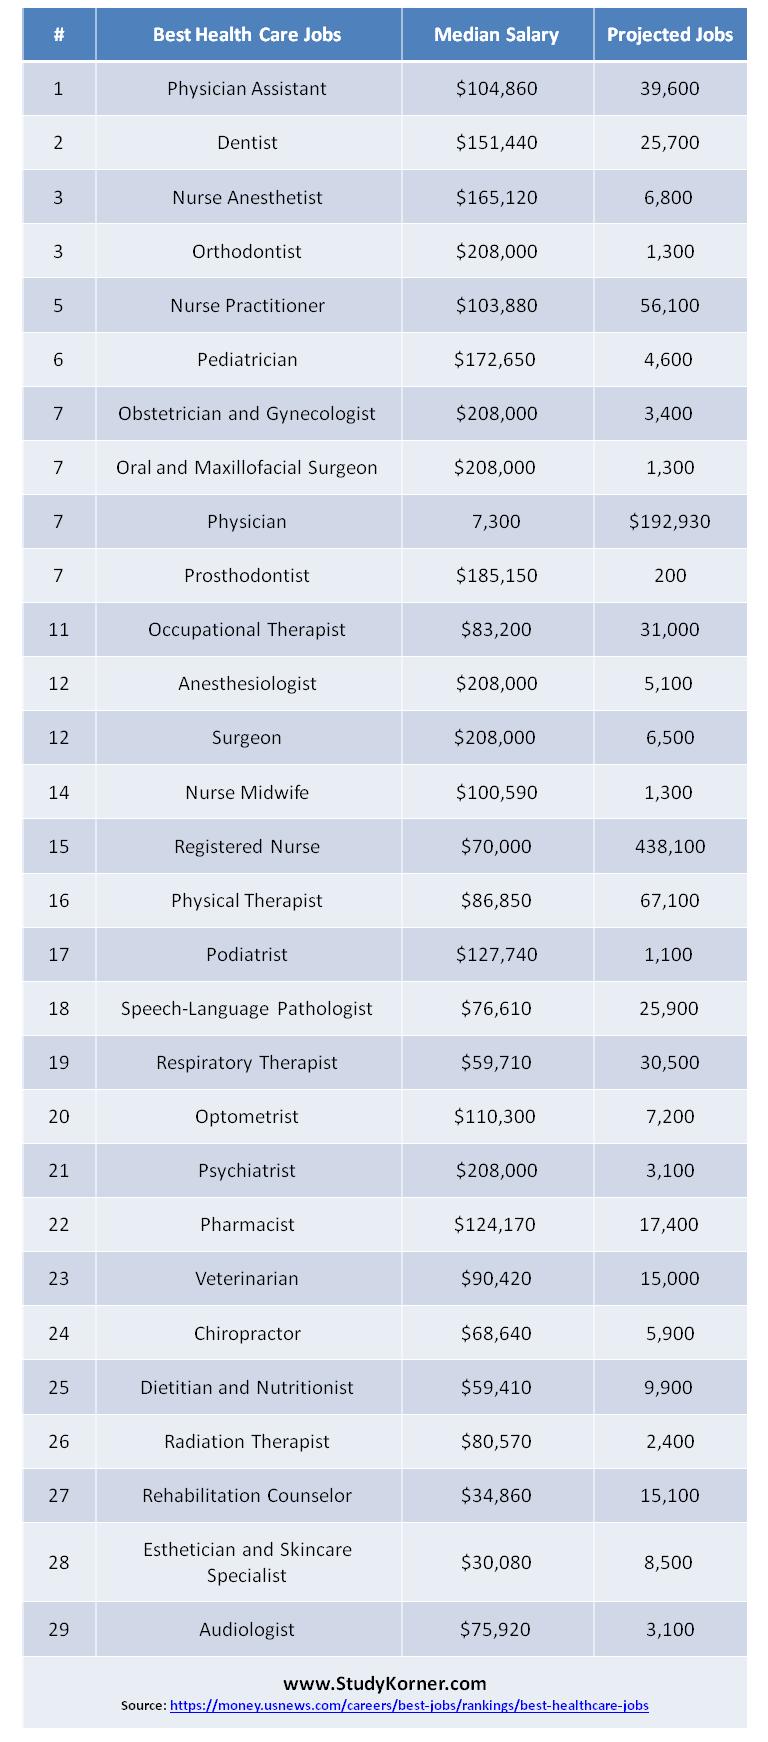 29 Best Health Care Jobs 2019 Care jobs, Health care